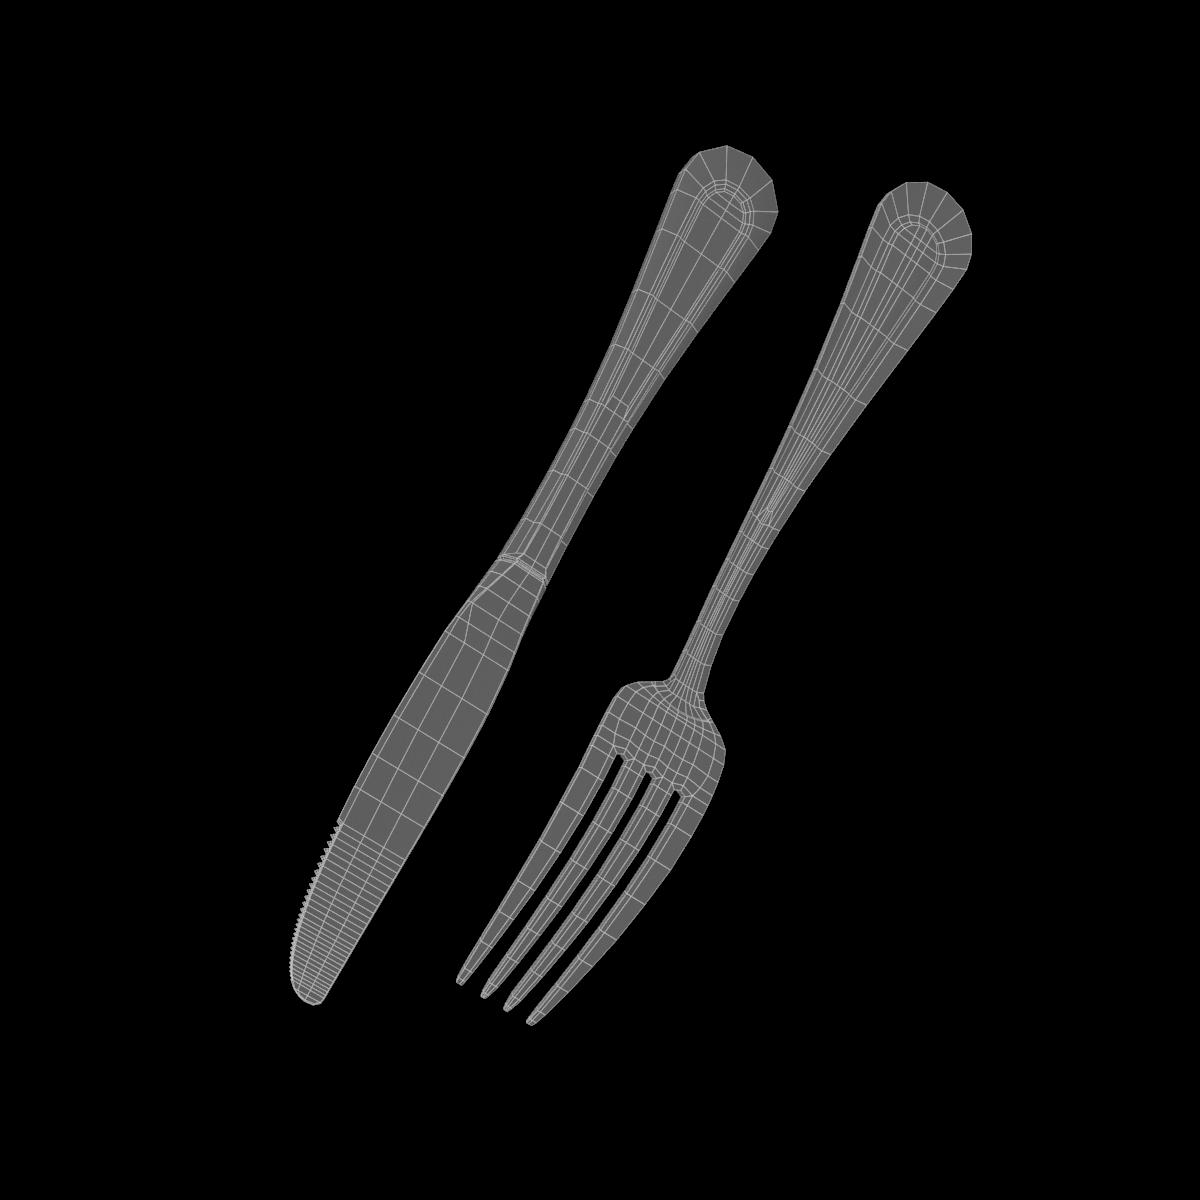 dessert knife and fork classic cutlery 3d model 3ds c4d fbx max max ma mb obj txt png stl 285940